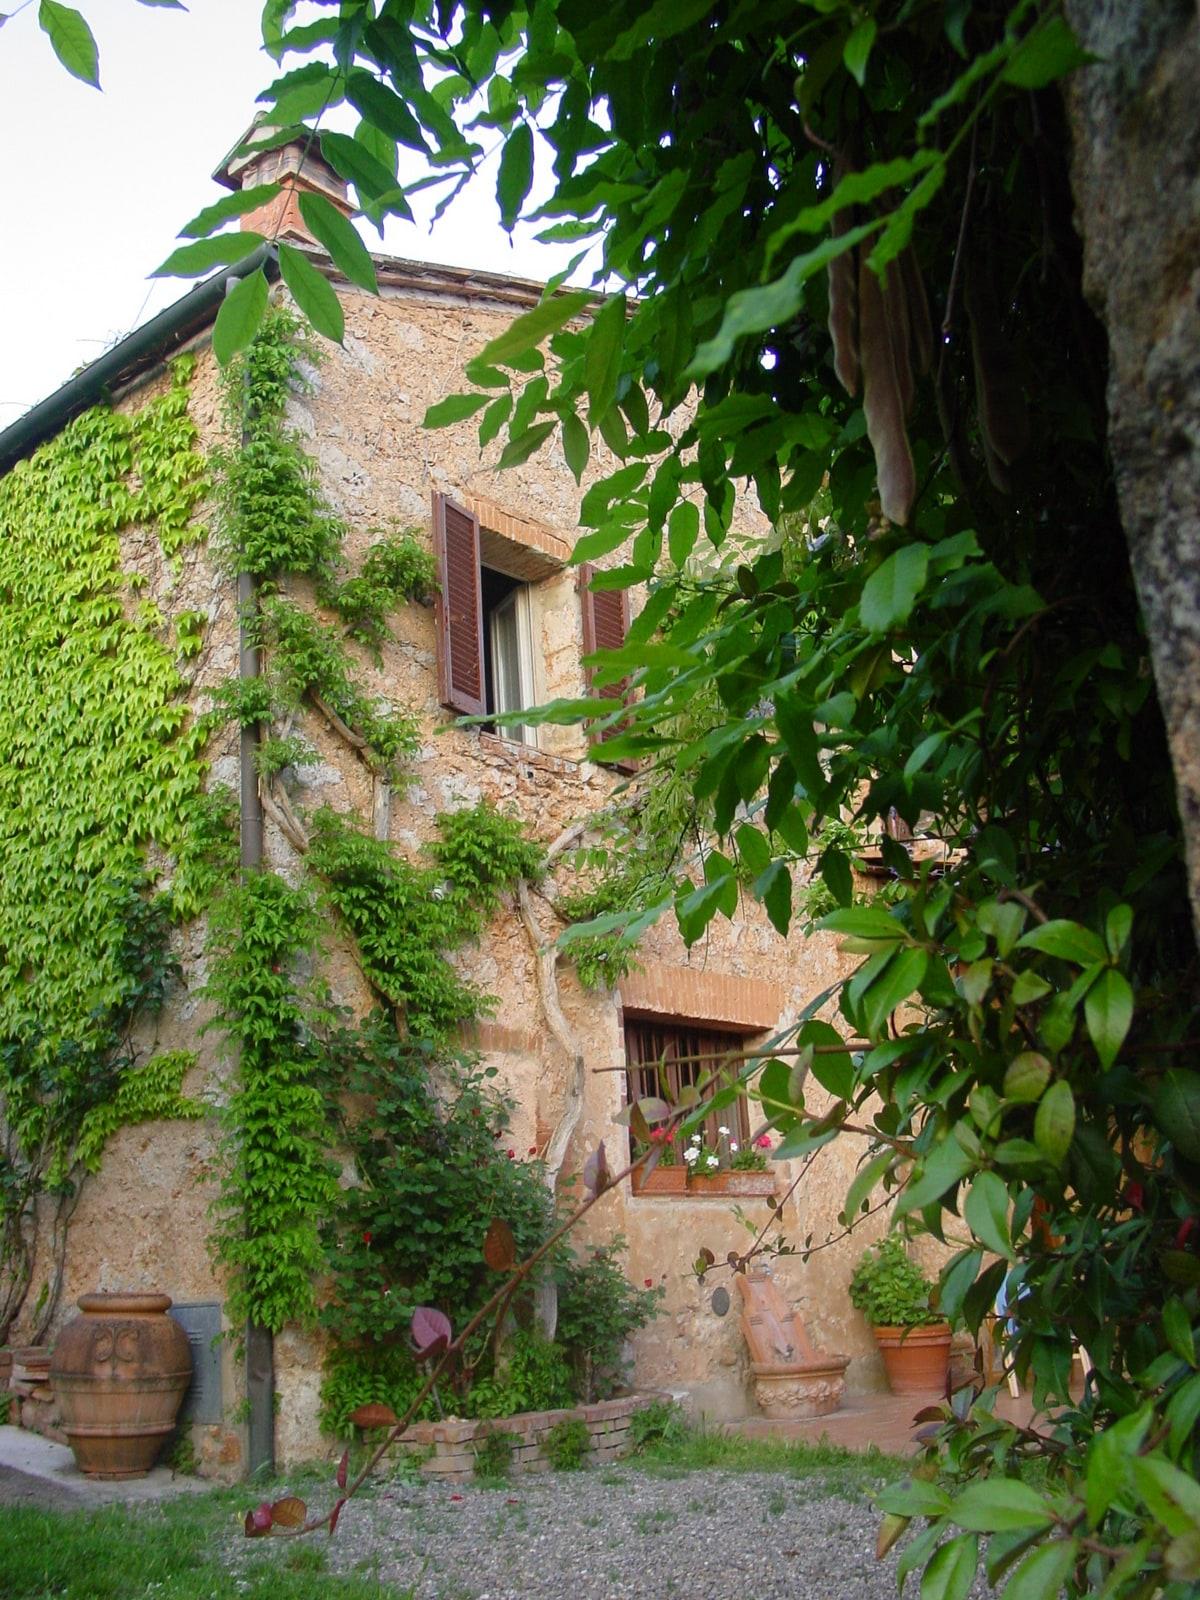 Tuscany/Siena - LA MIA FONTE rooms